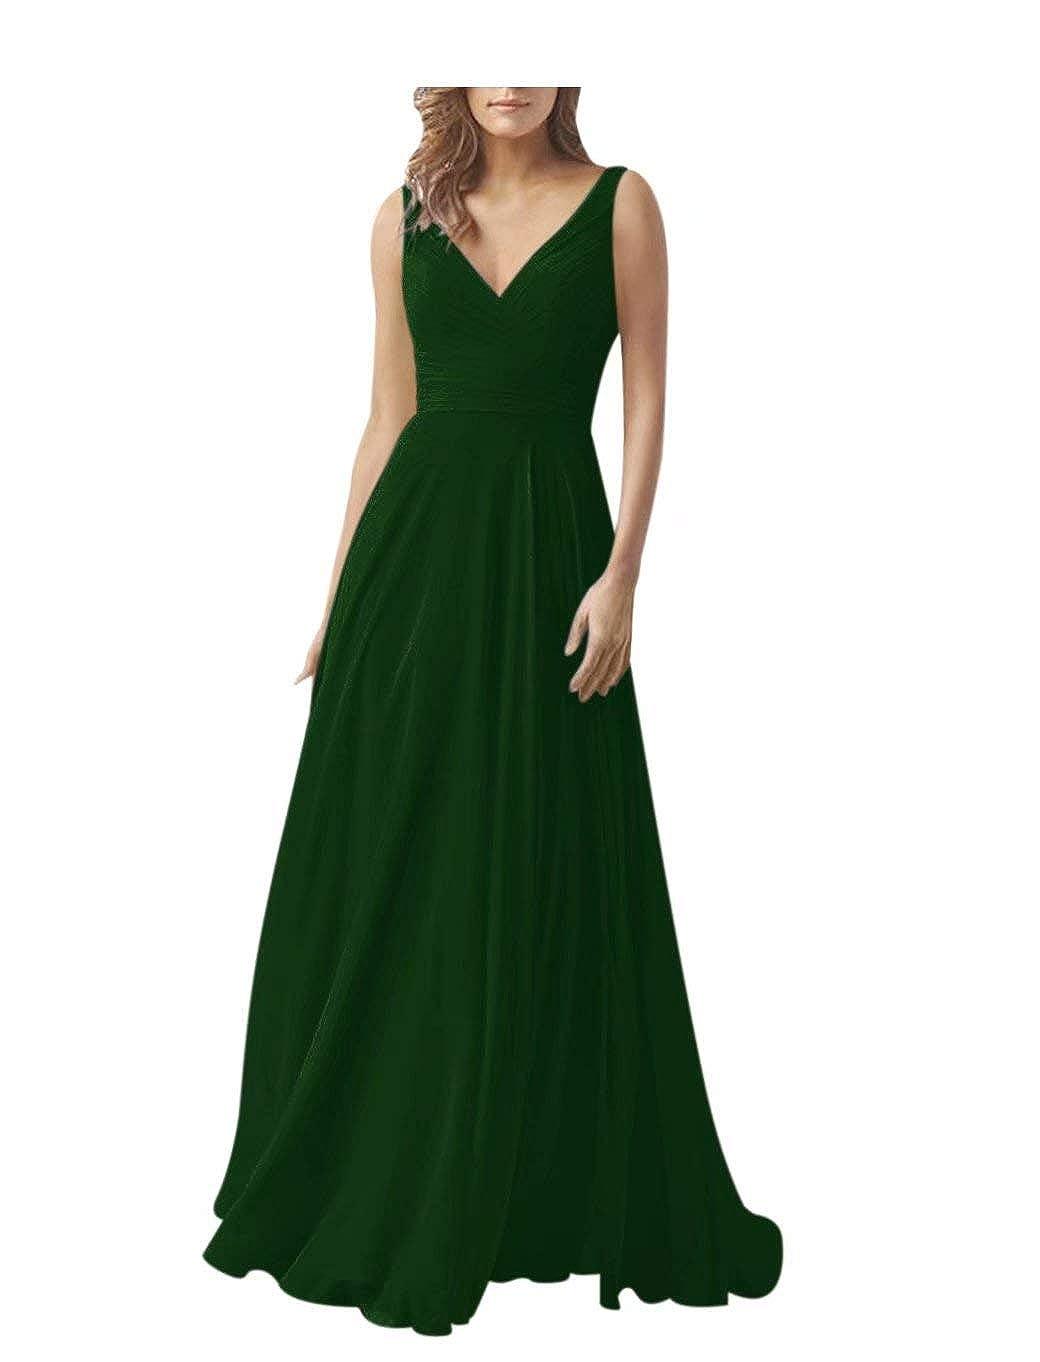 XJLY Womens A Line V Neck Chiffon Bridesmaid Dresses Evening Dress Party Dress